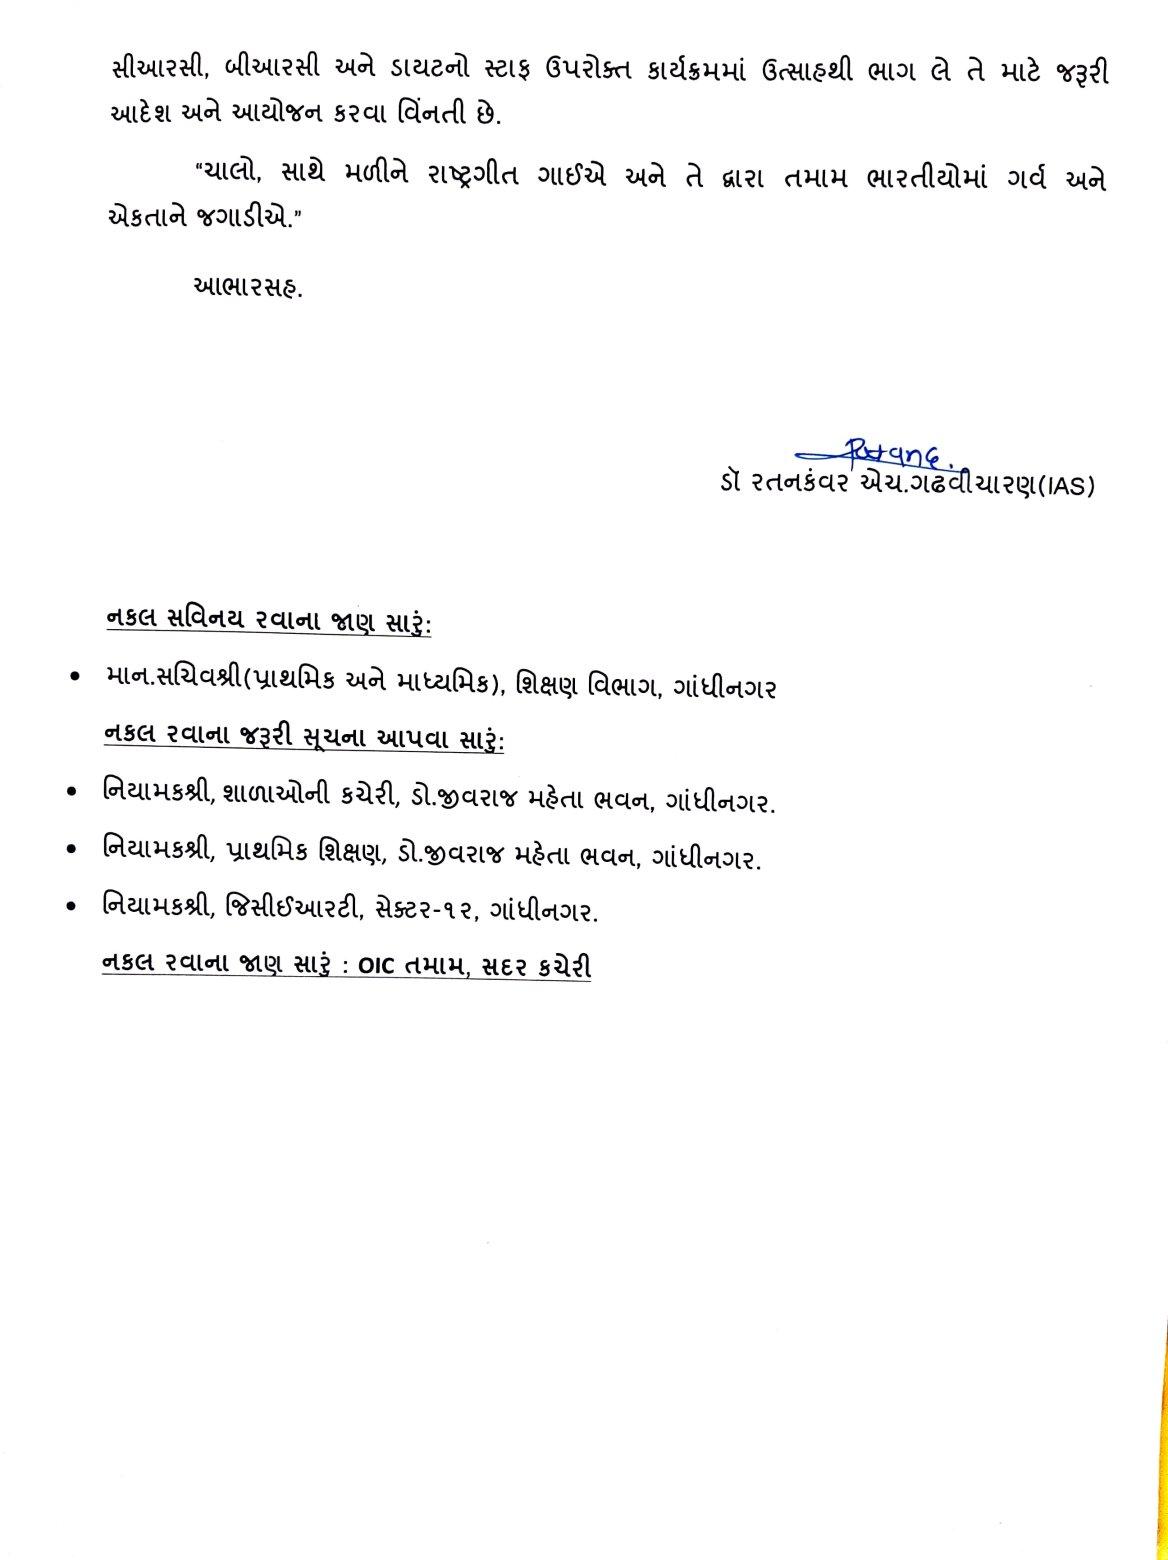 https://project303.blogspot.com/2021/08/aazadi-ka-amrut-mahotsav.html